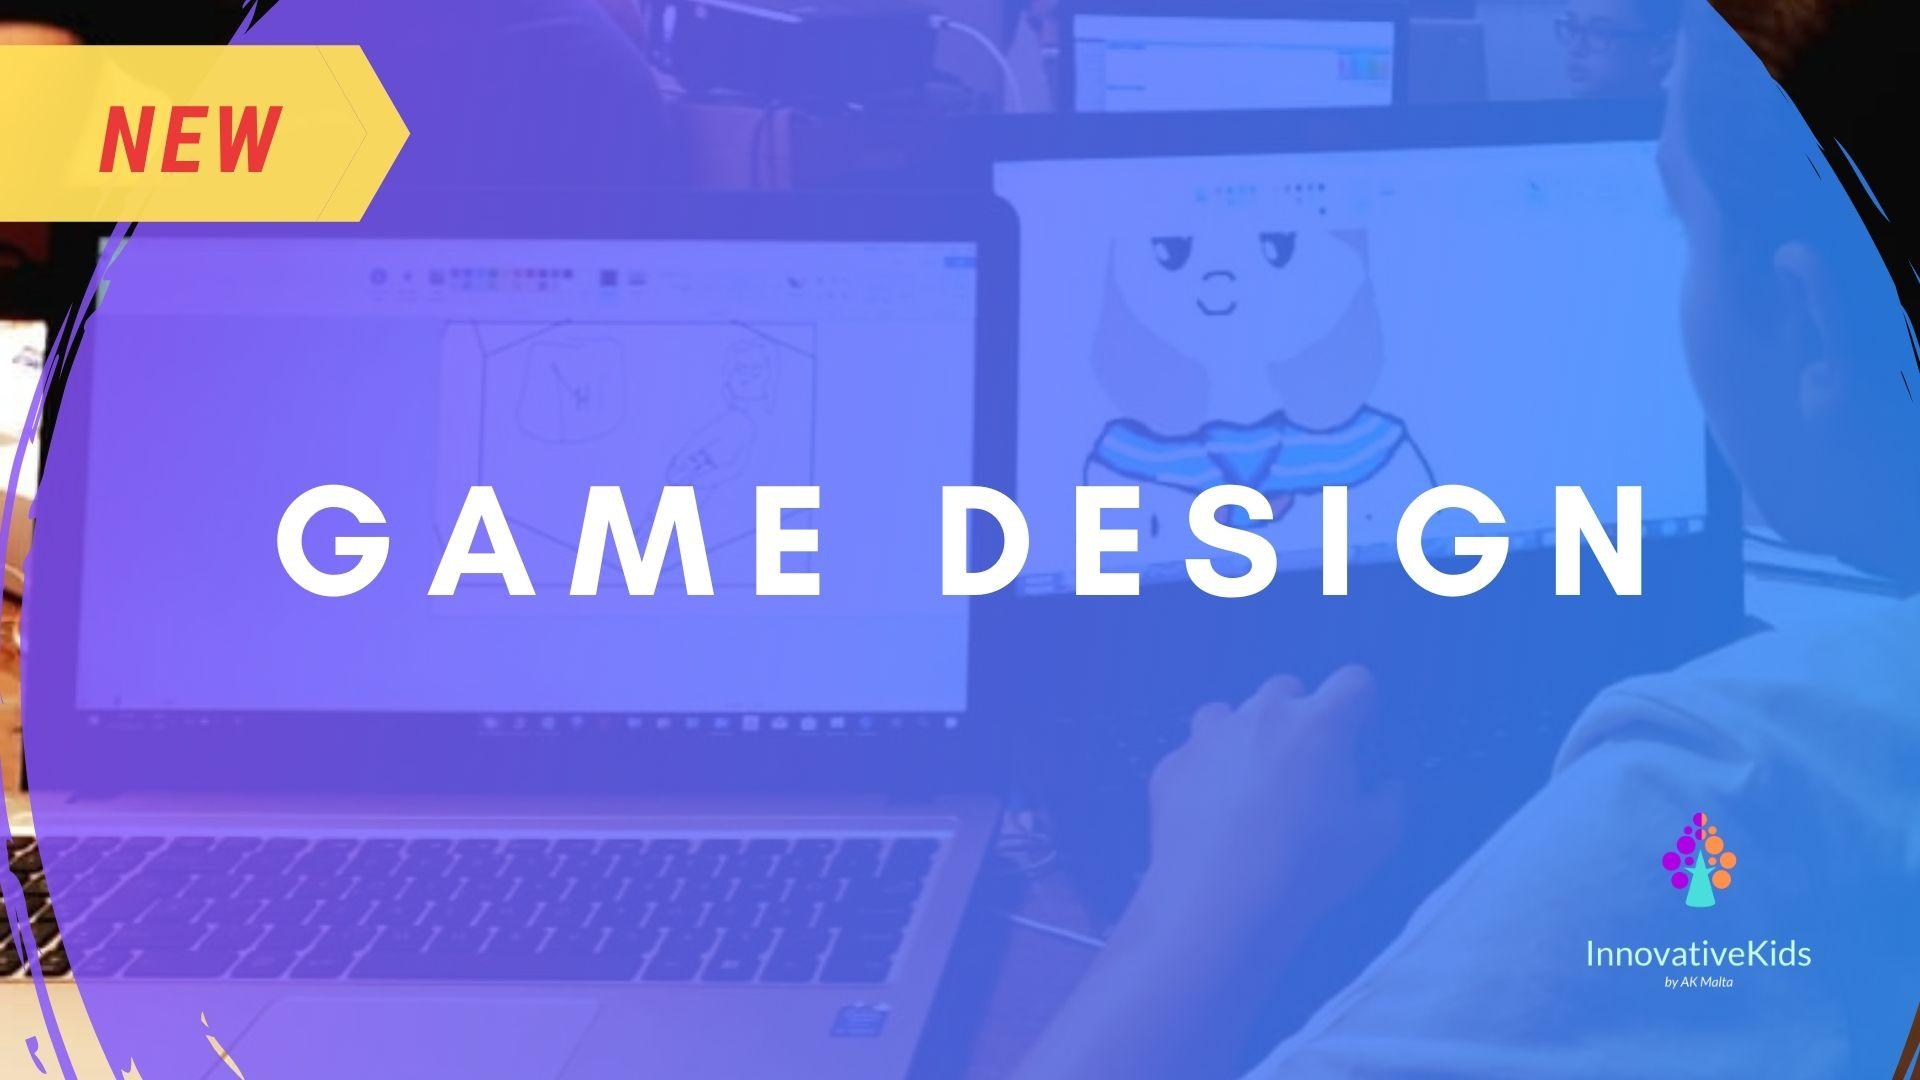 Game Design course 2021 by InnovativeKids